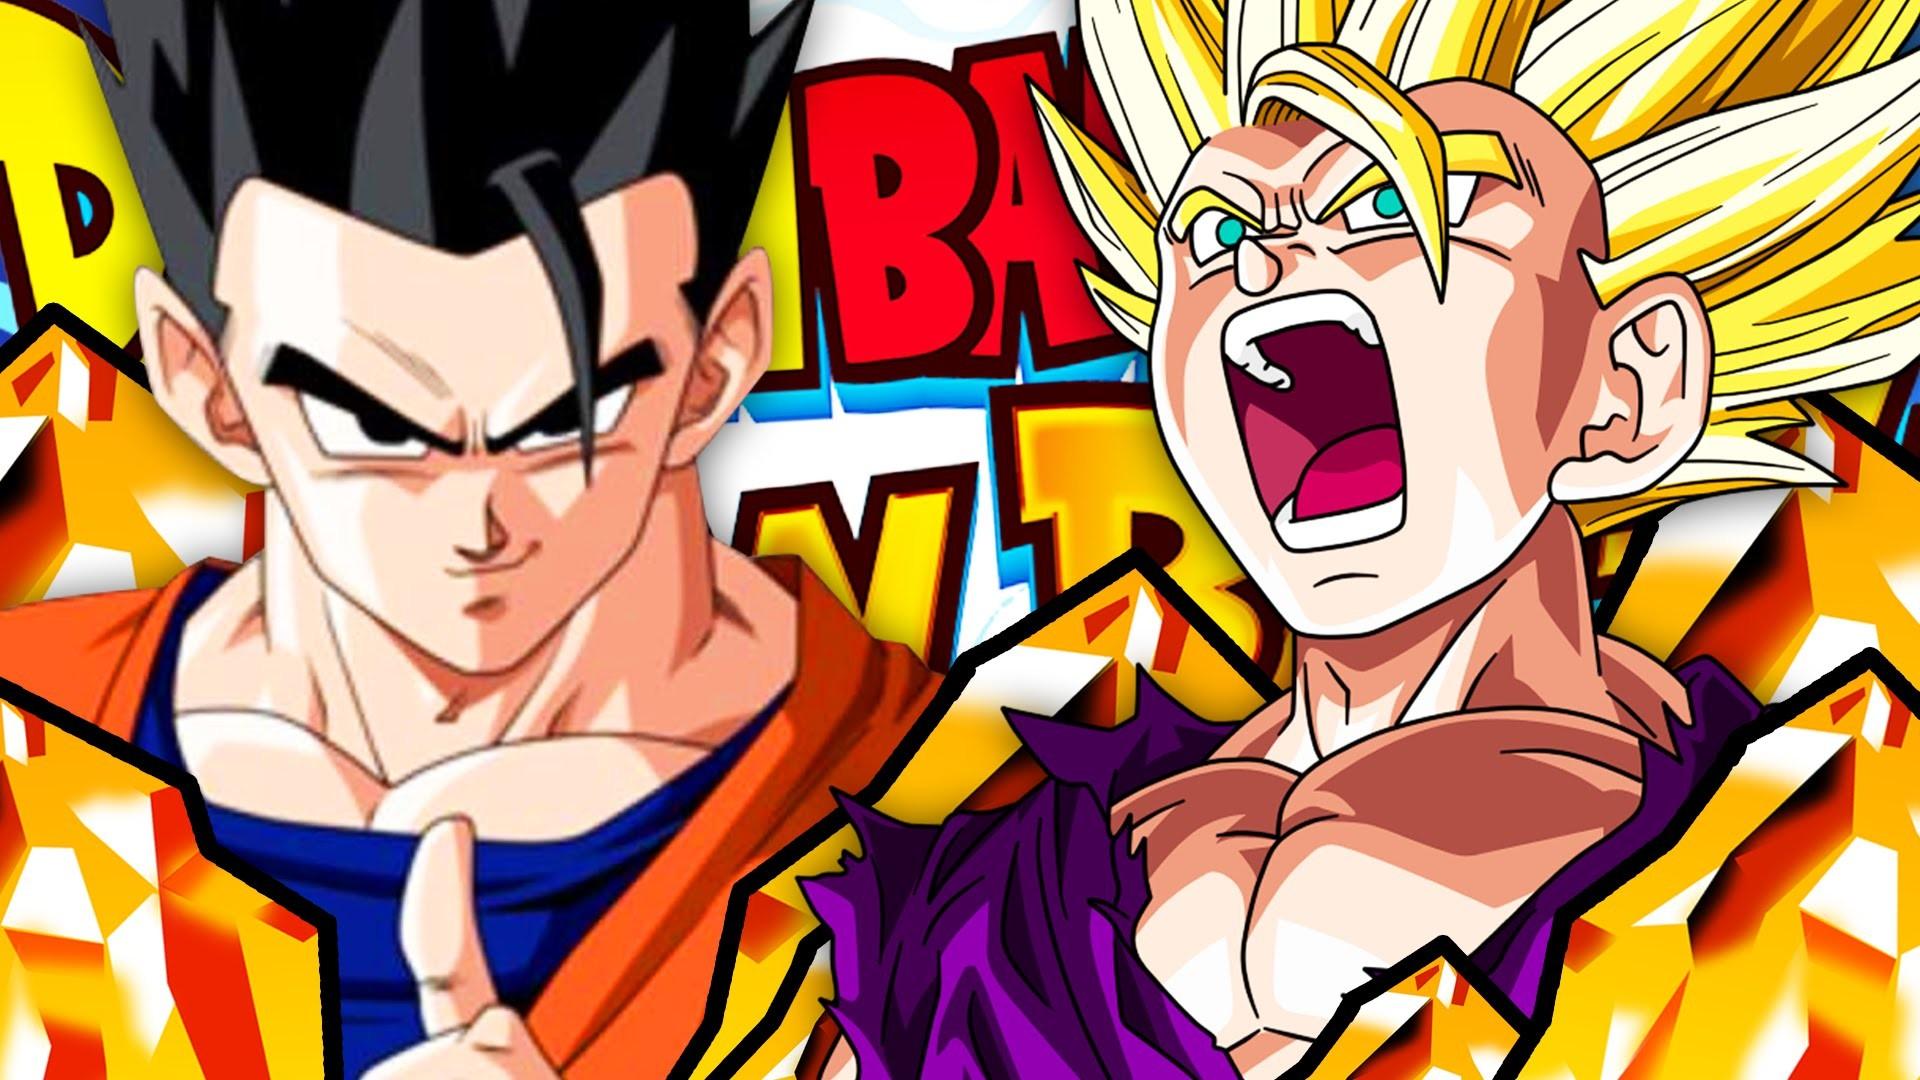 Res: 1920x1080, ULTIMATE GOHAN SUMMONING ATTEMPT - Dragon Ball Z Dokkan Battle - Part 9 -  YouTube